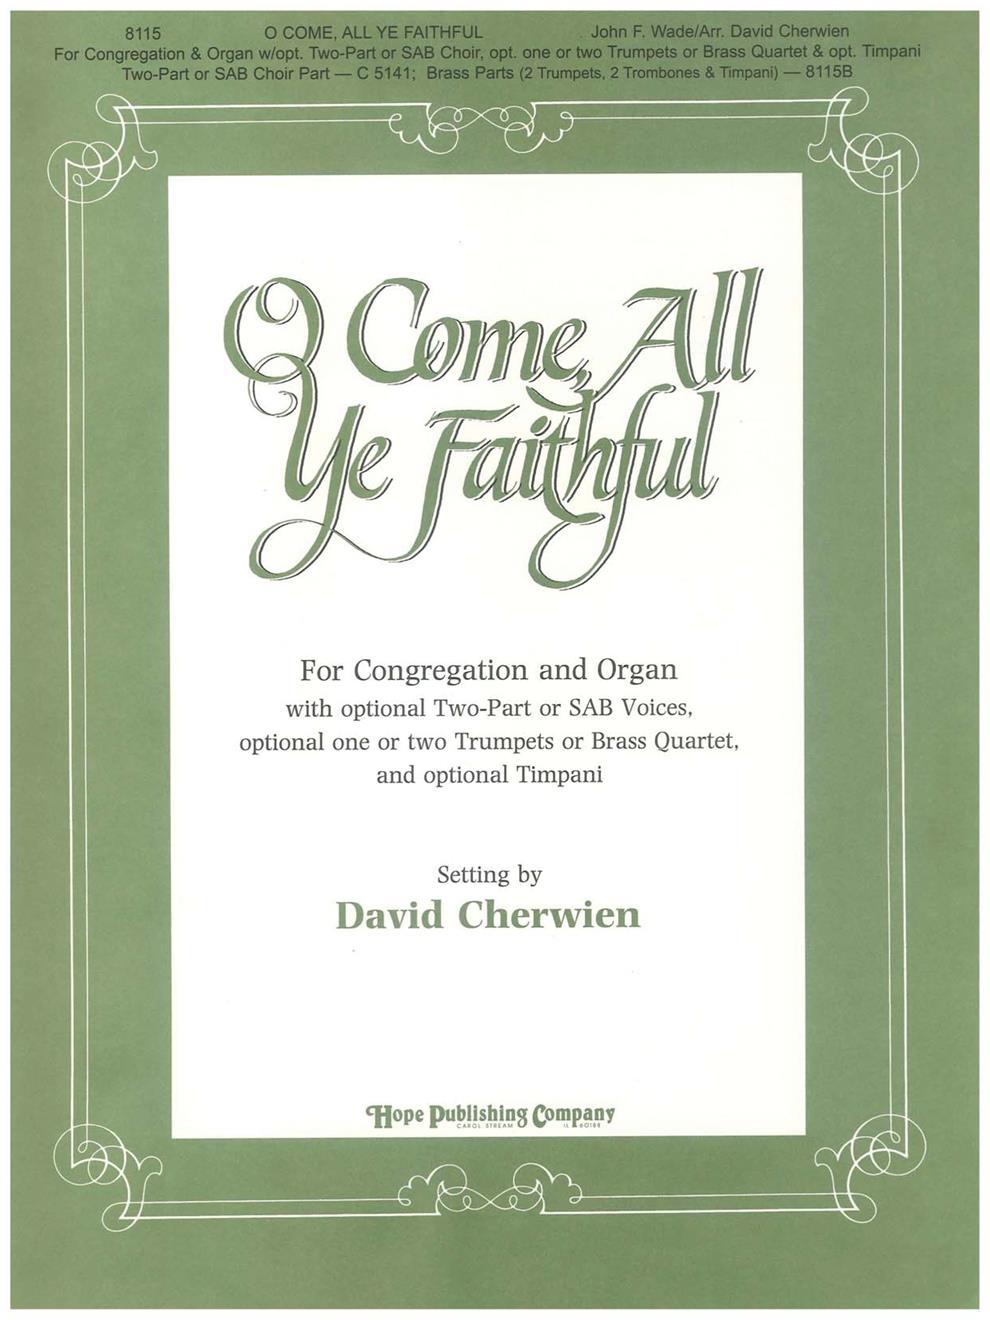 O Come All Ye Faithful - Organ Score Cover Image